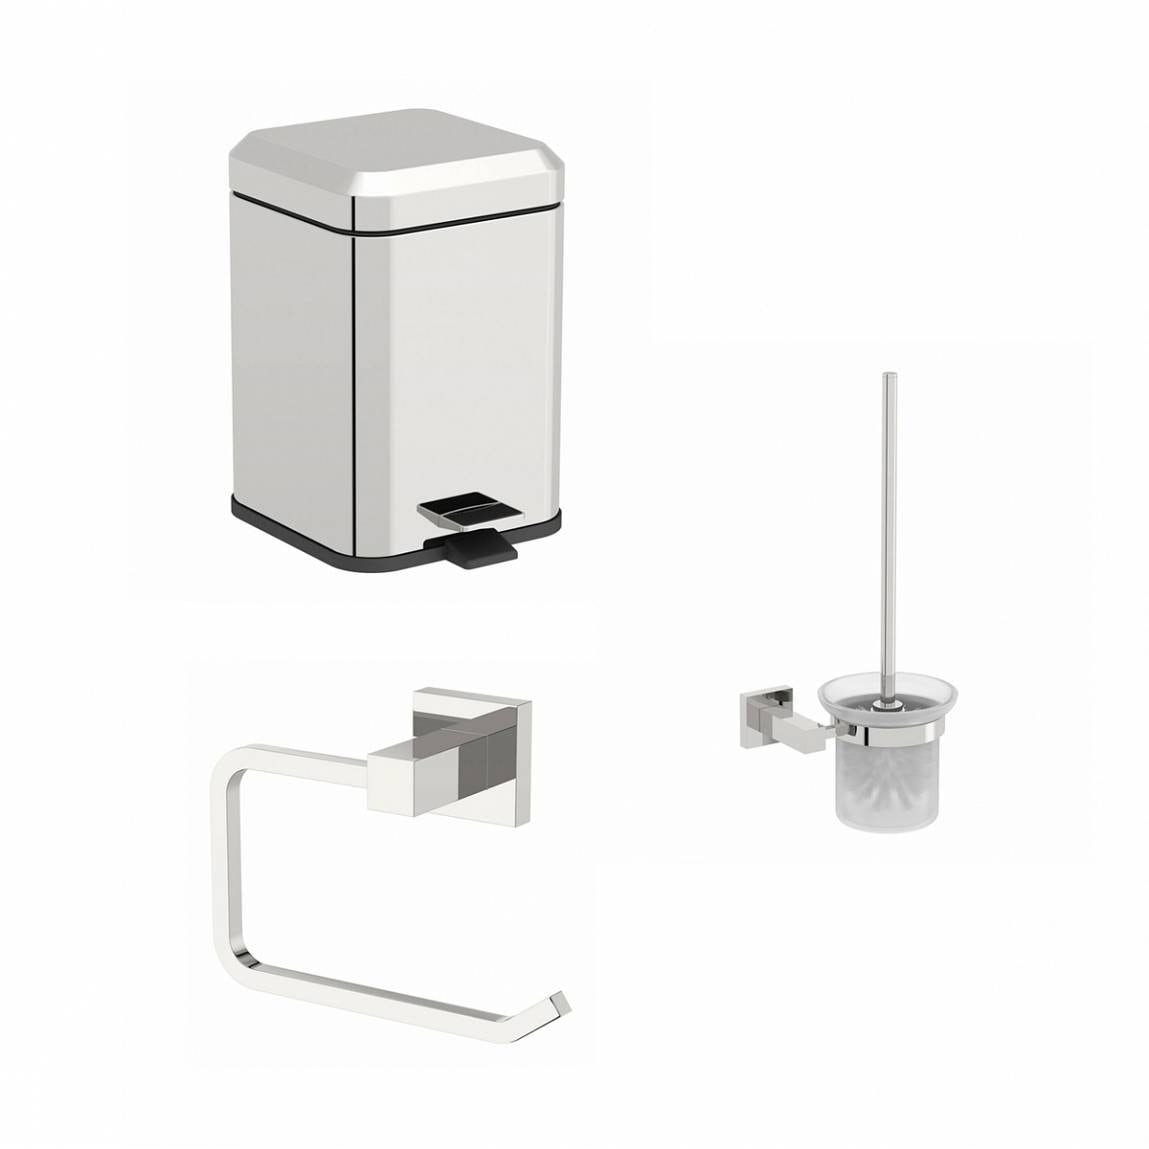 Cubik toilet accessory set for Washroom set